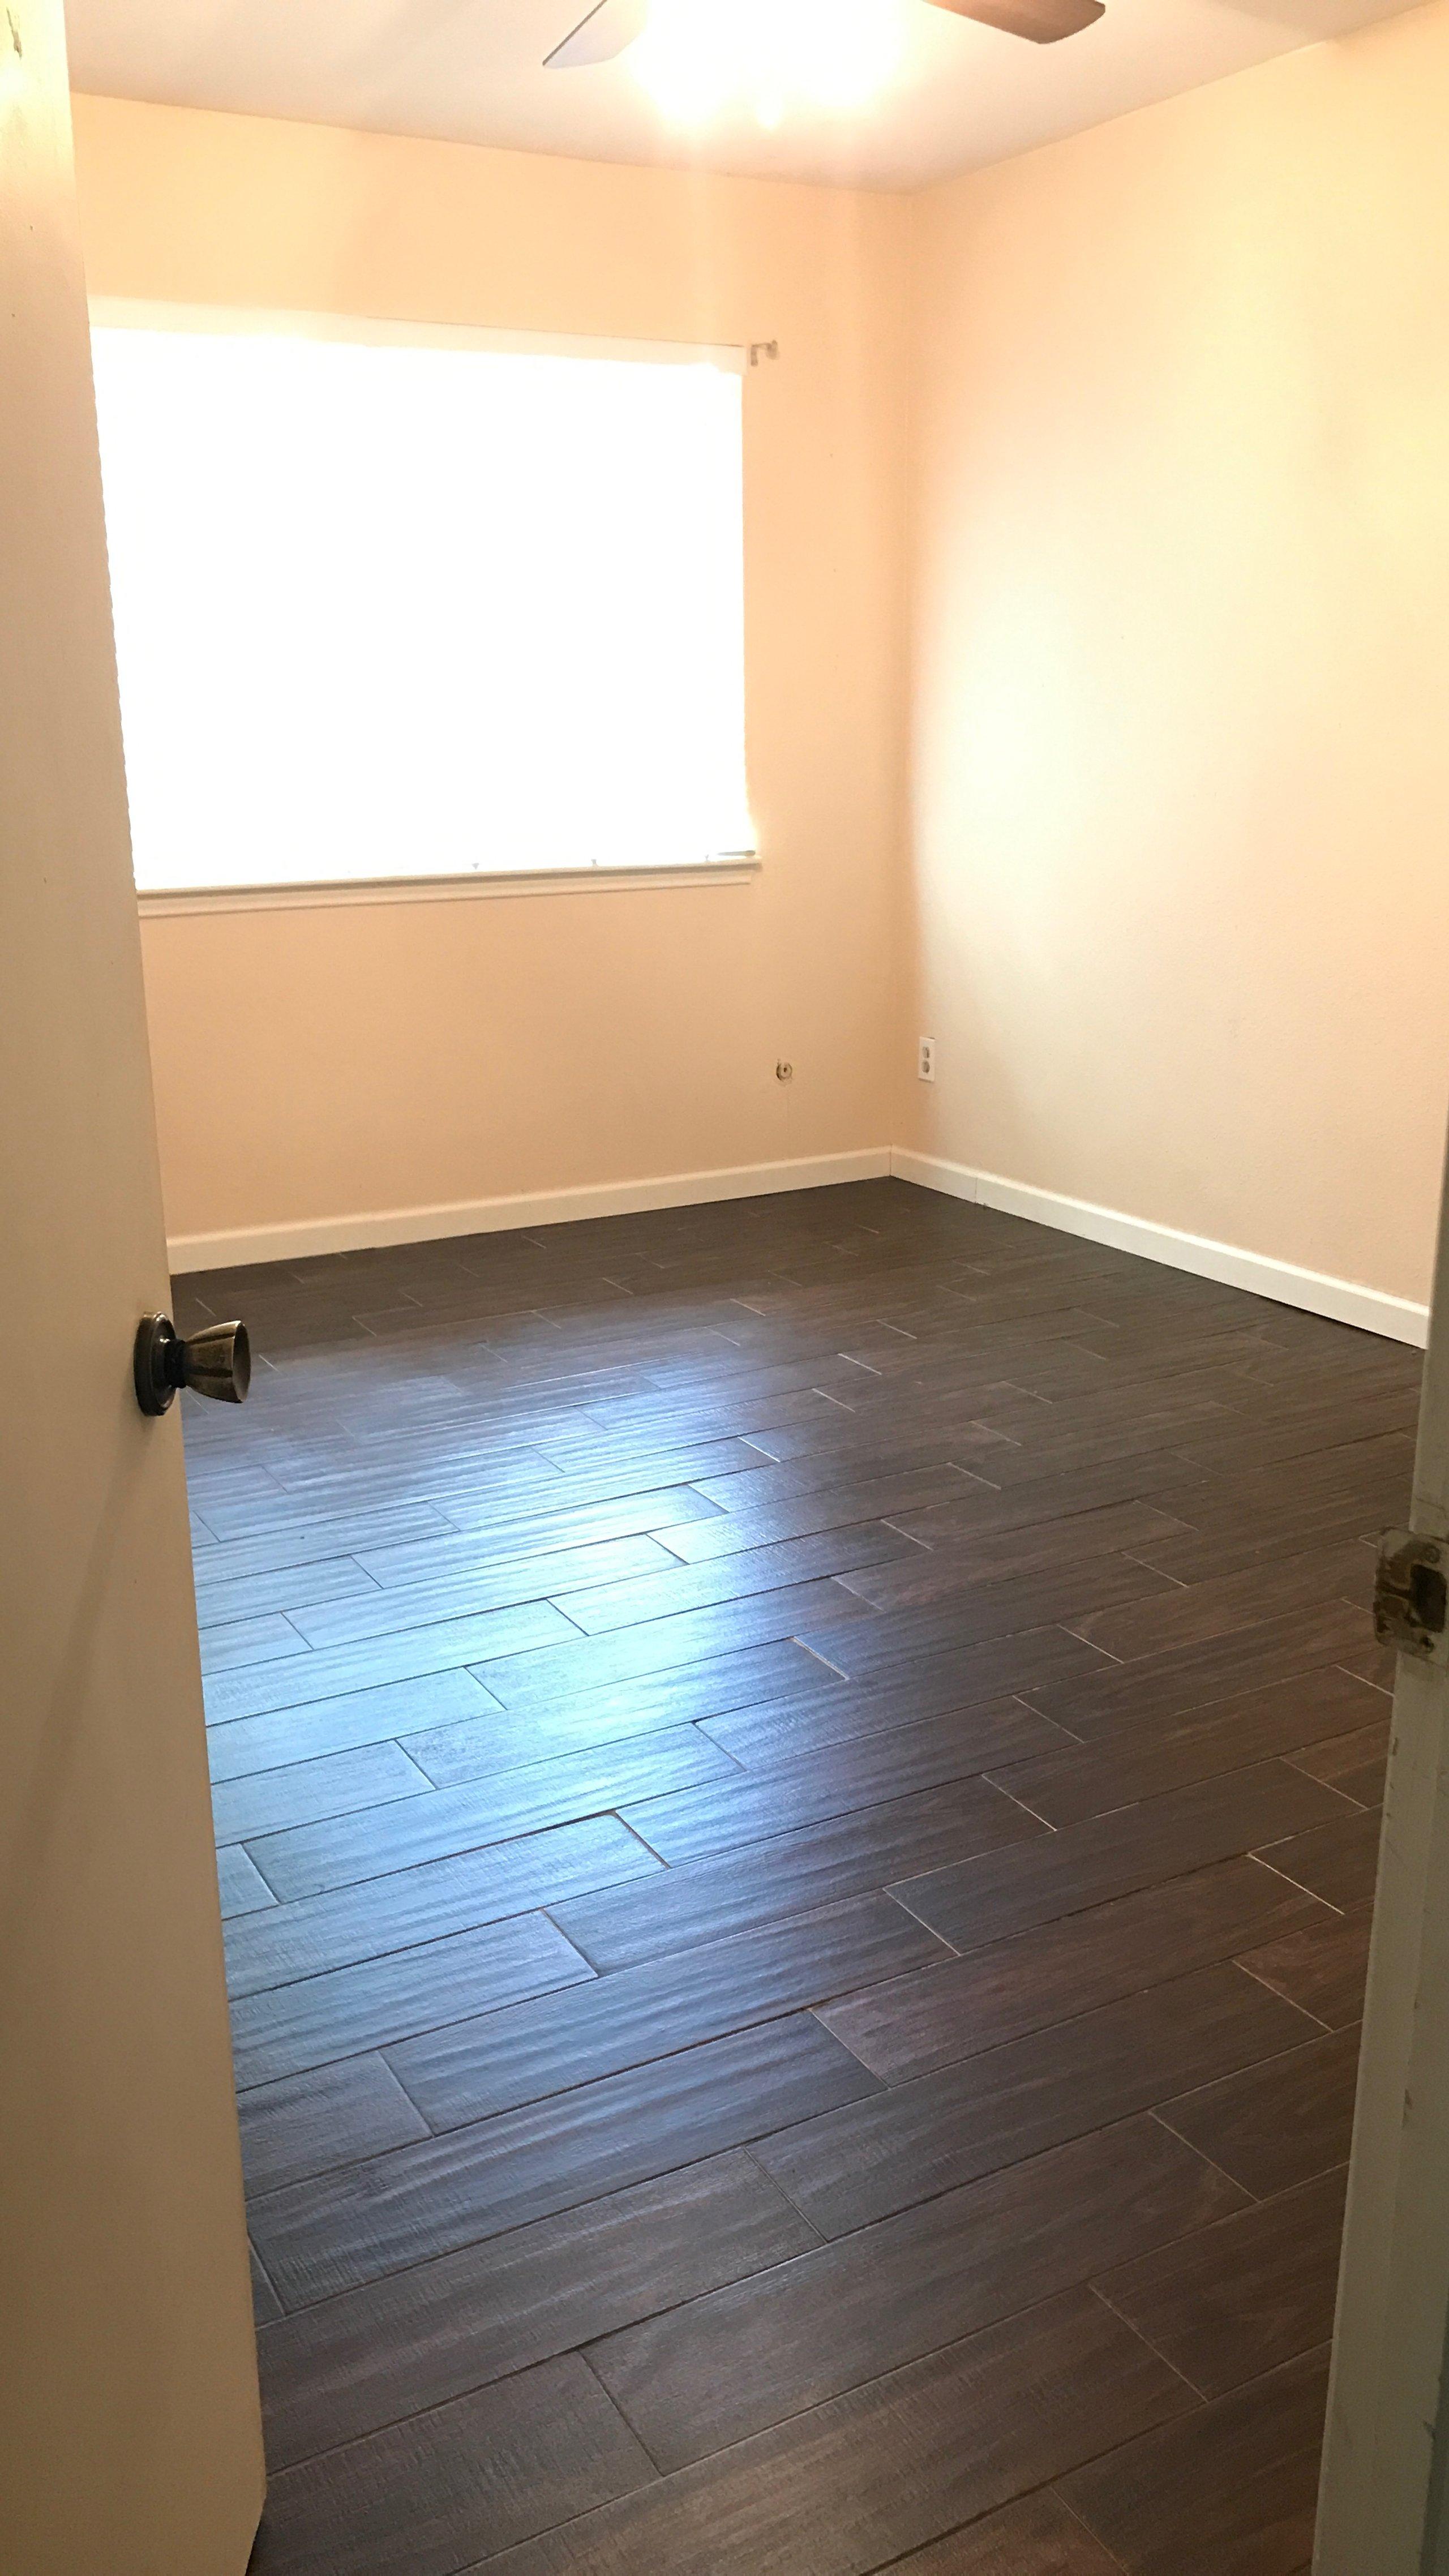 13x11 Bedroom self storage unit